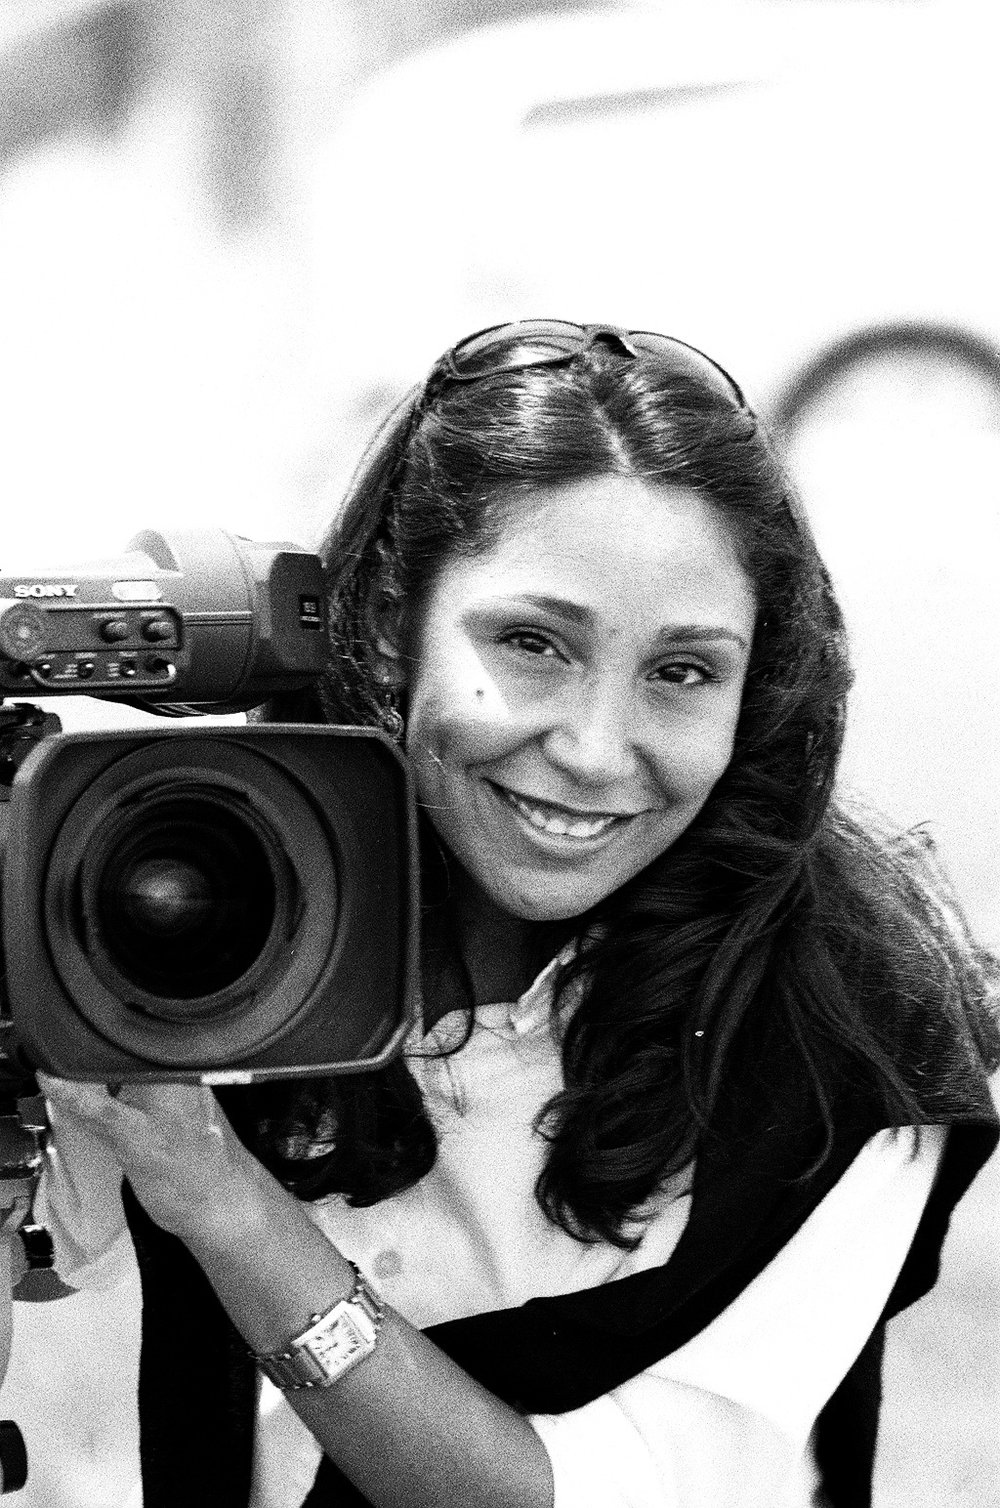 Haifaa Al-Mansour - First female Saudi filmmaker, award winning documentarian